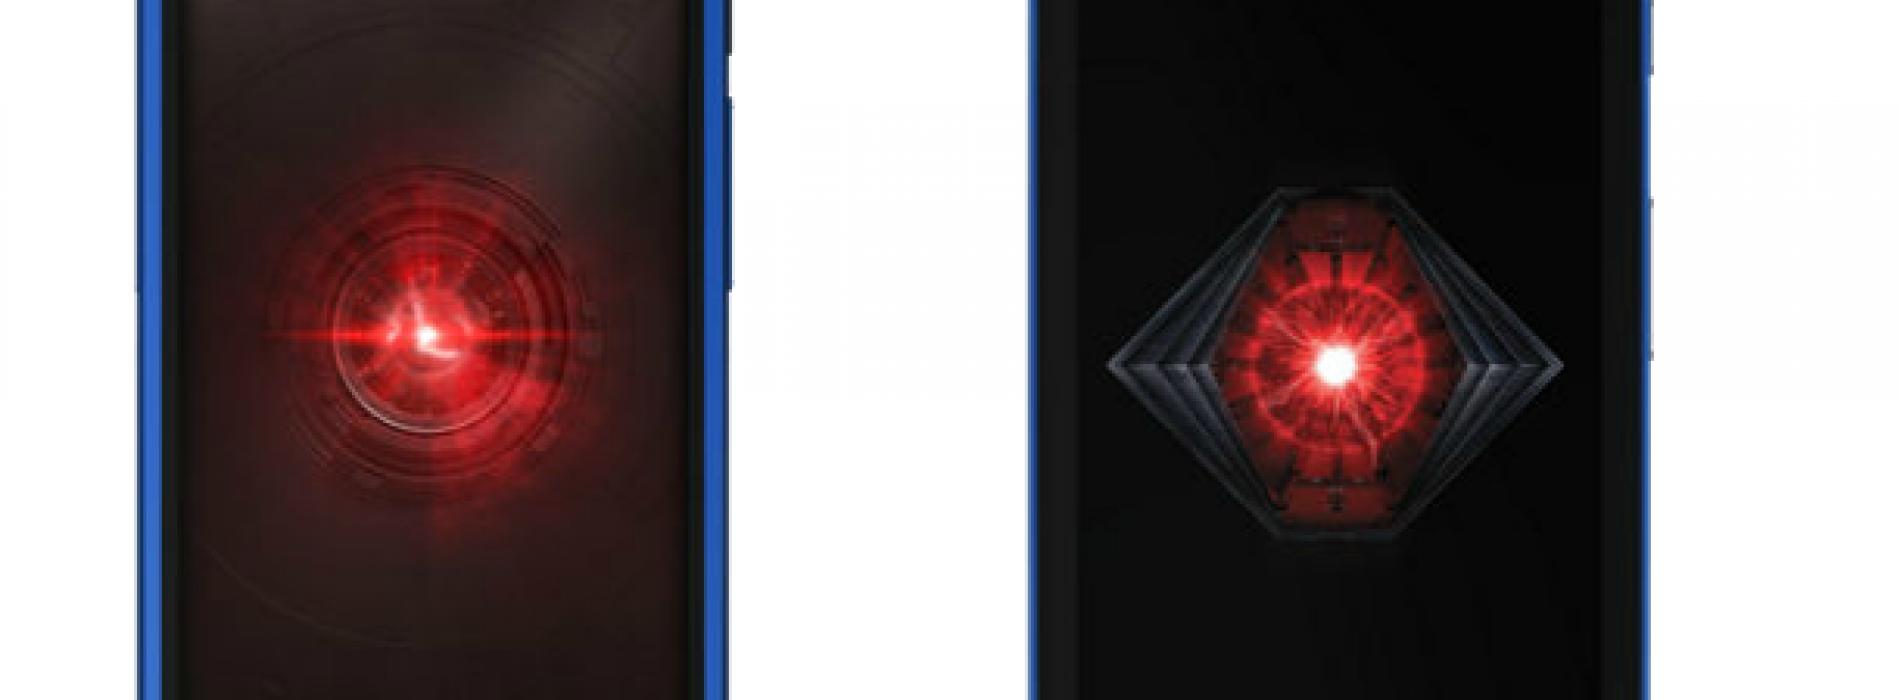 Verizon Motorola DROID RAZR HD and DROID RAZR M now available in blue